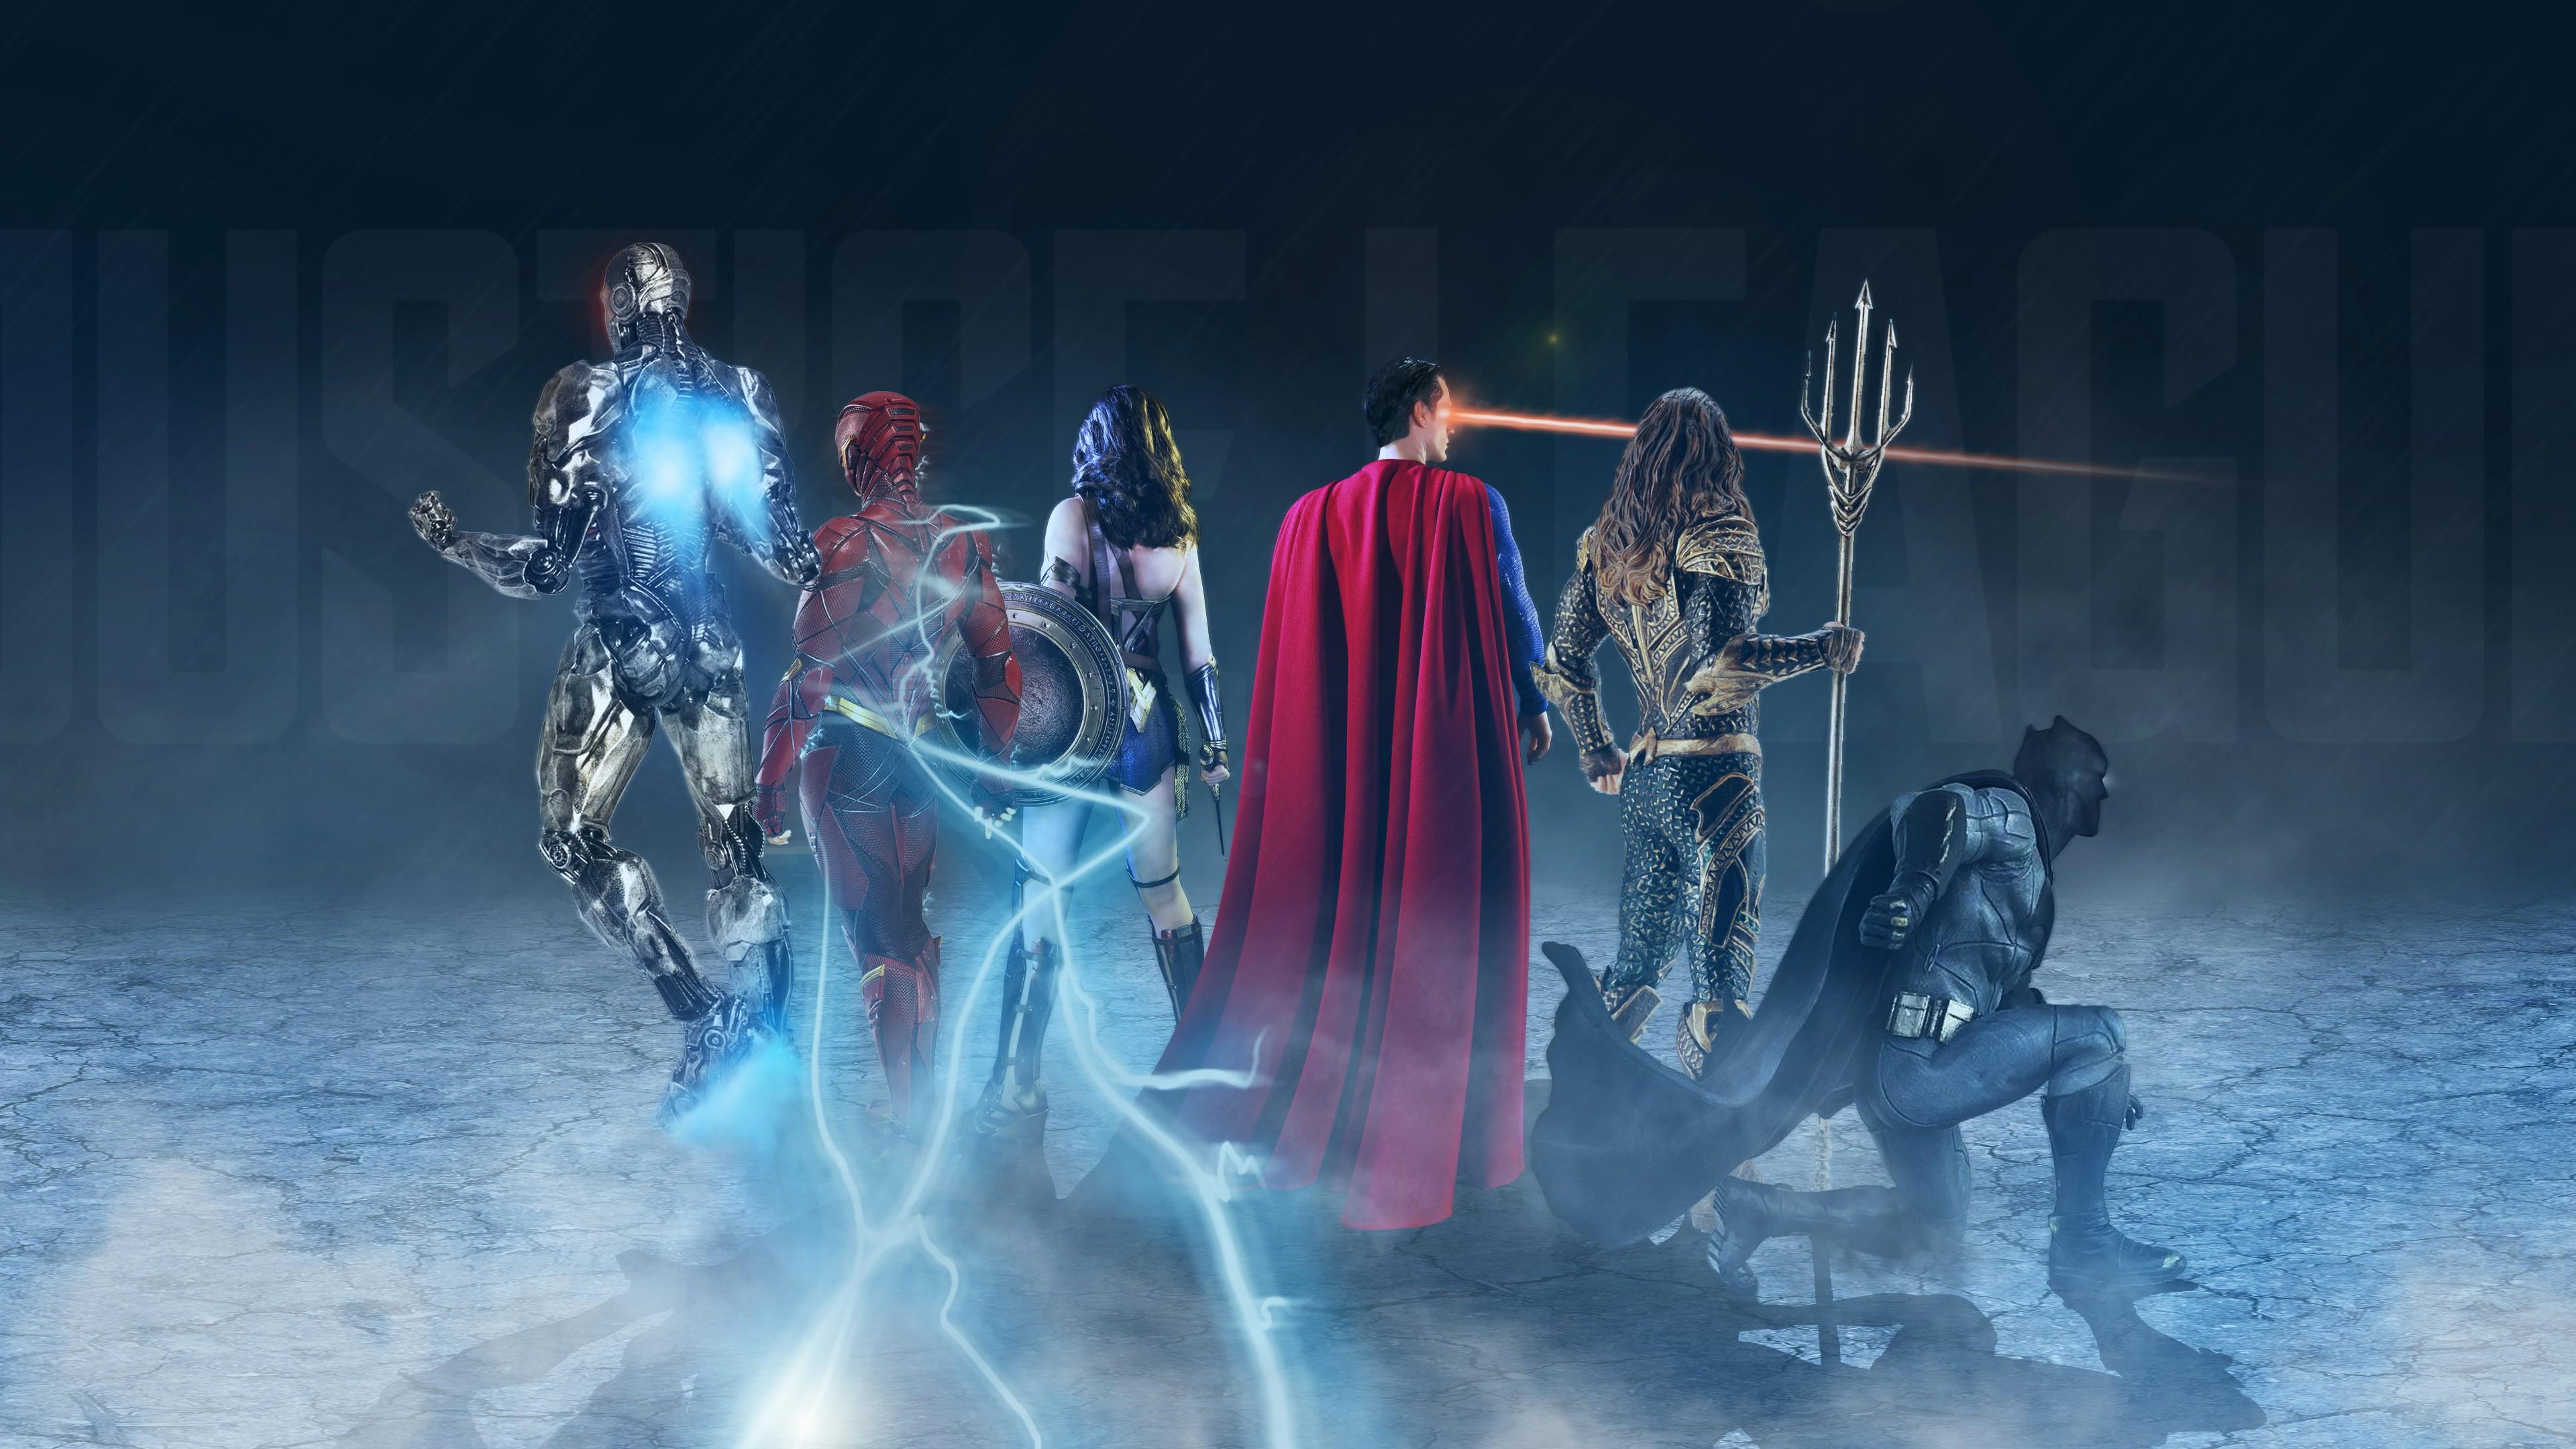 Elvis 3d Wallpaper Justice League Superheroes Artwork 4k 8k Wallpapers Hd